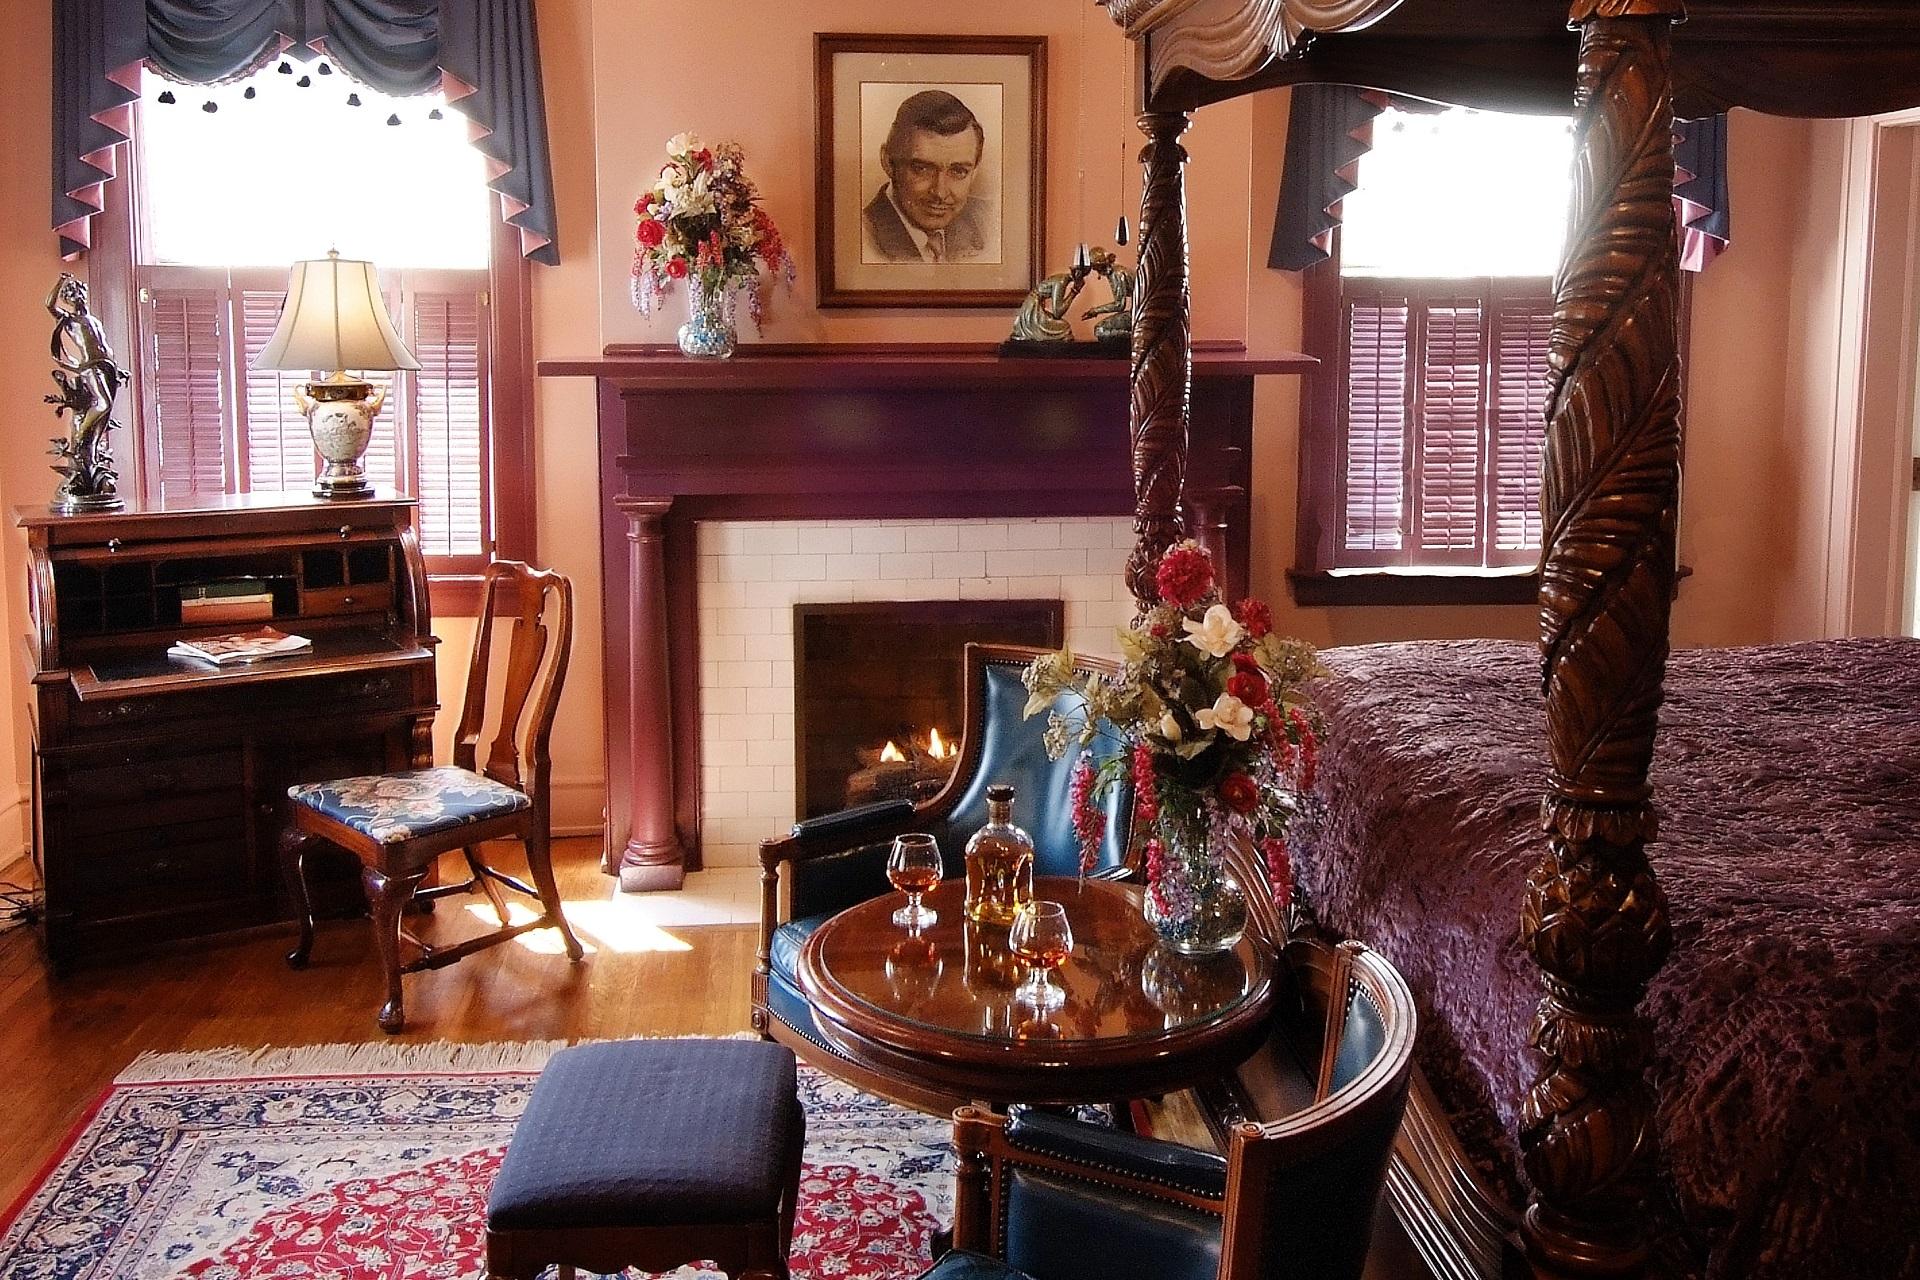 Rhetts Room at tara a country inn